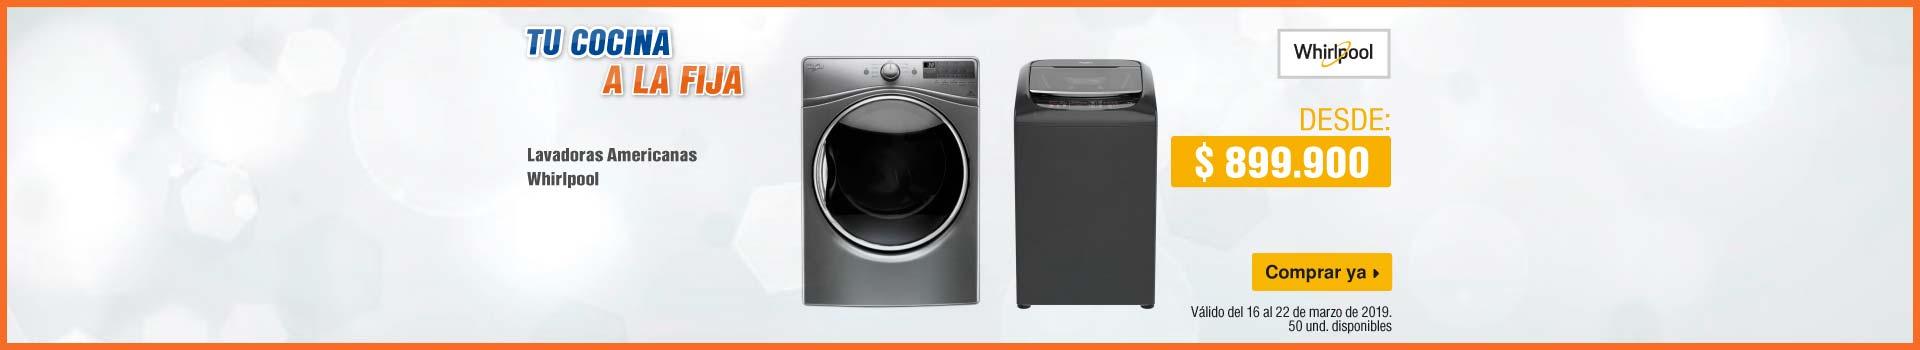 AK-KT-mayores-1-ELECT-BCAT-lavadoras-WHIRLPOOL-160319-3